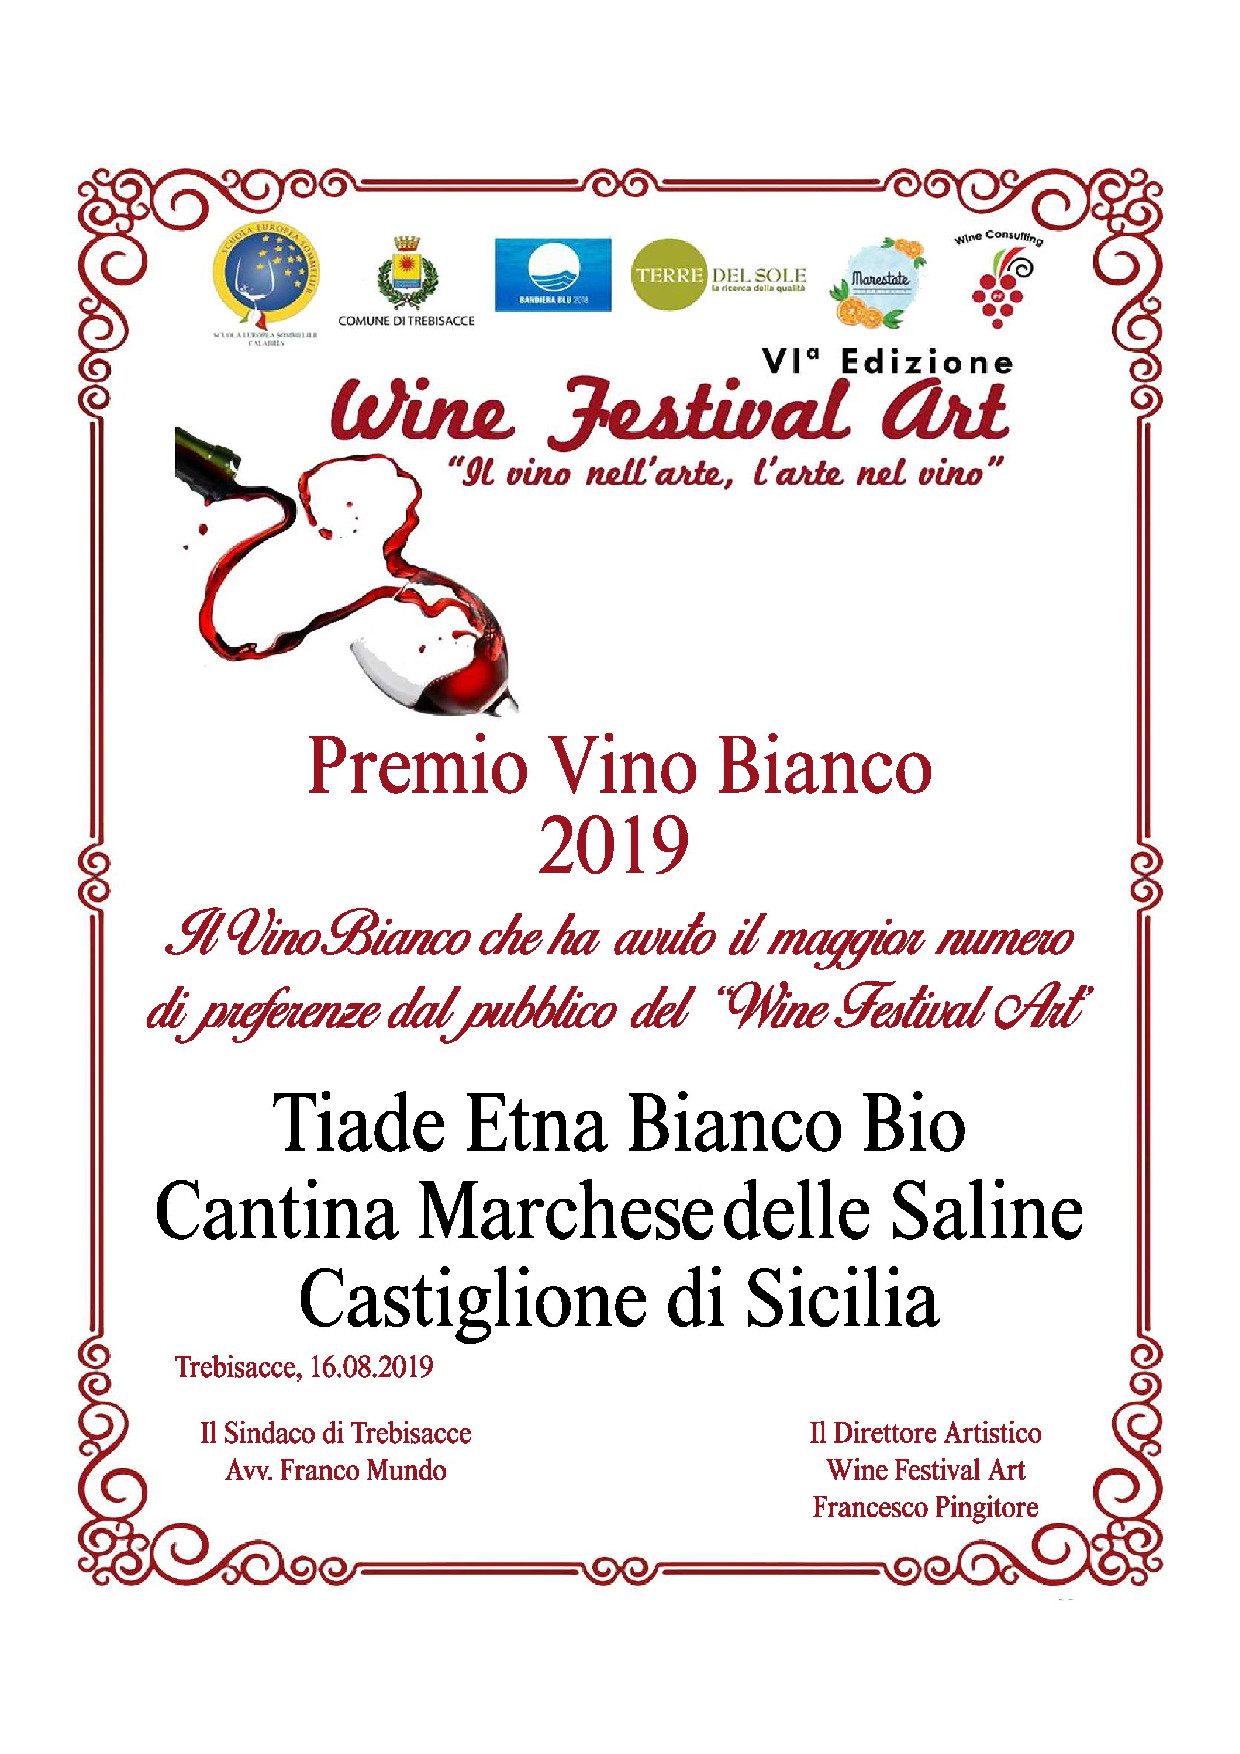 Etna Bianco Tìade Biologico, Premio Vino Bianco 2019 – Wine Festival Art